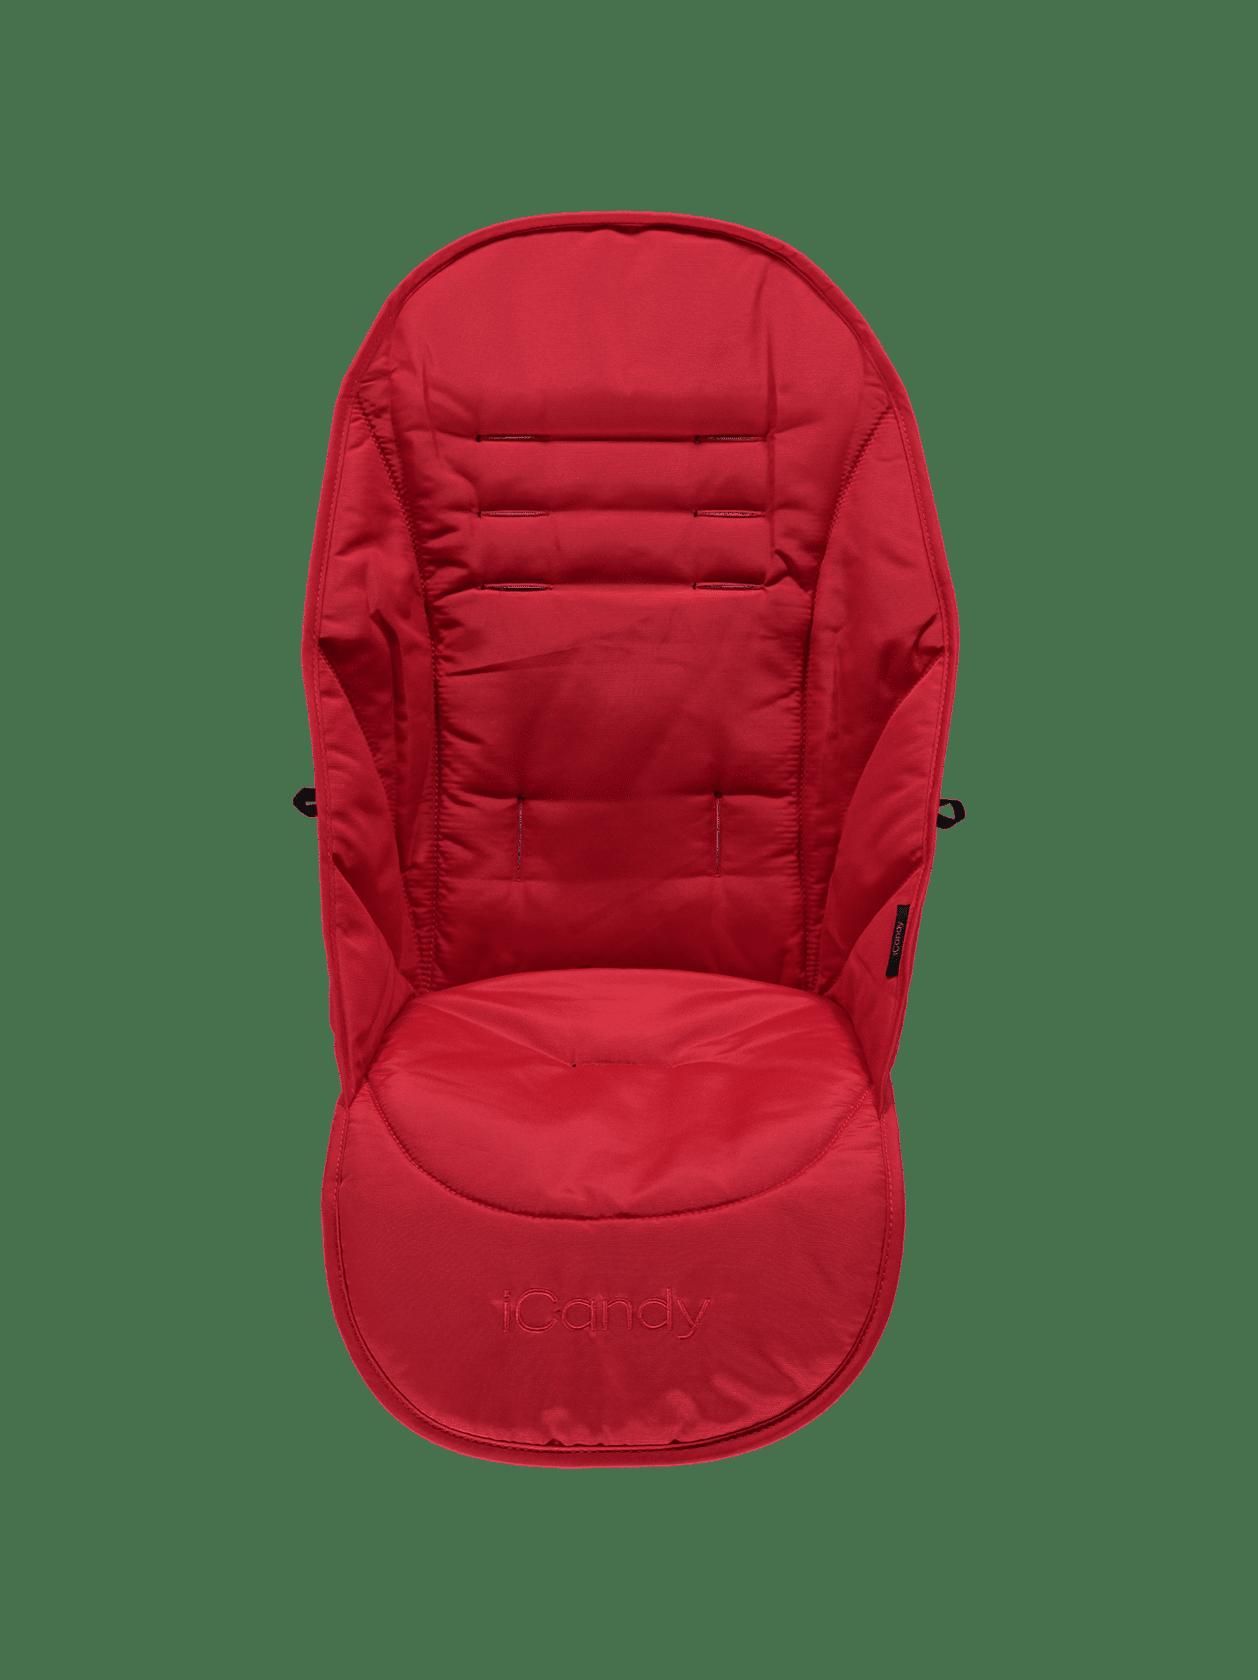 Strawberry2 Seat Liner - Lush